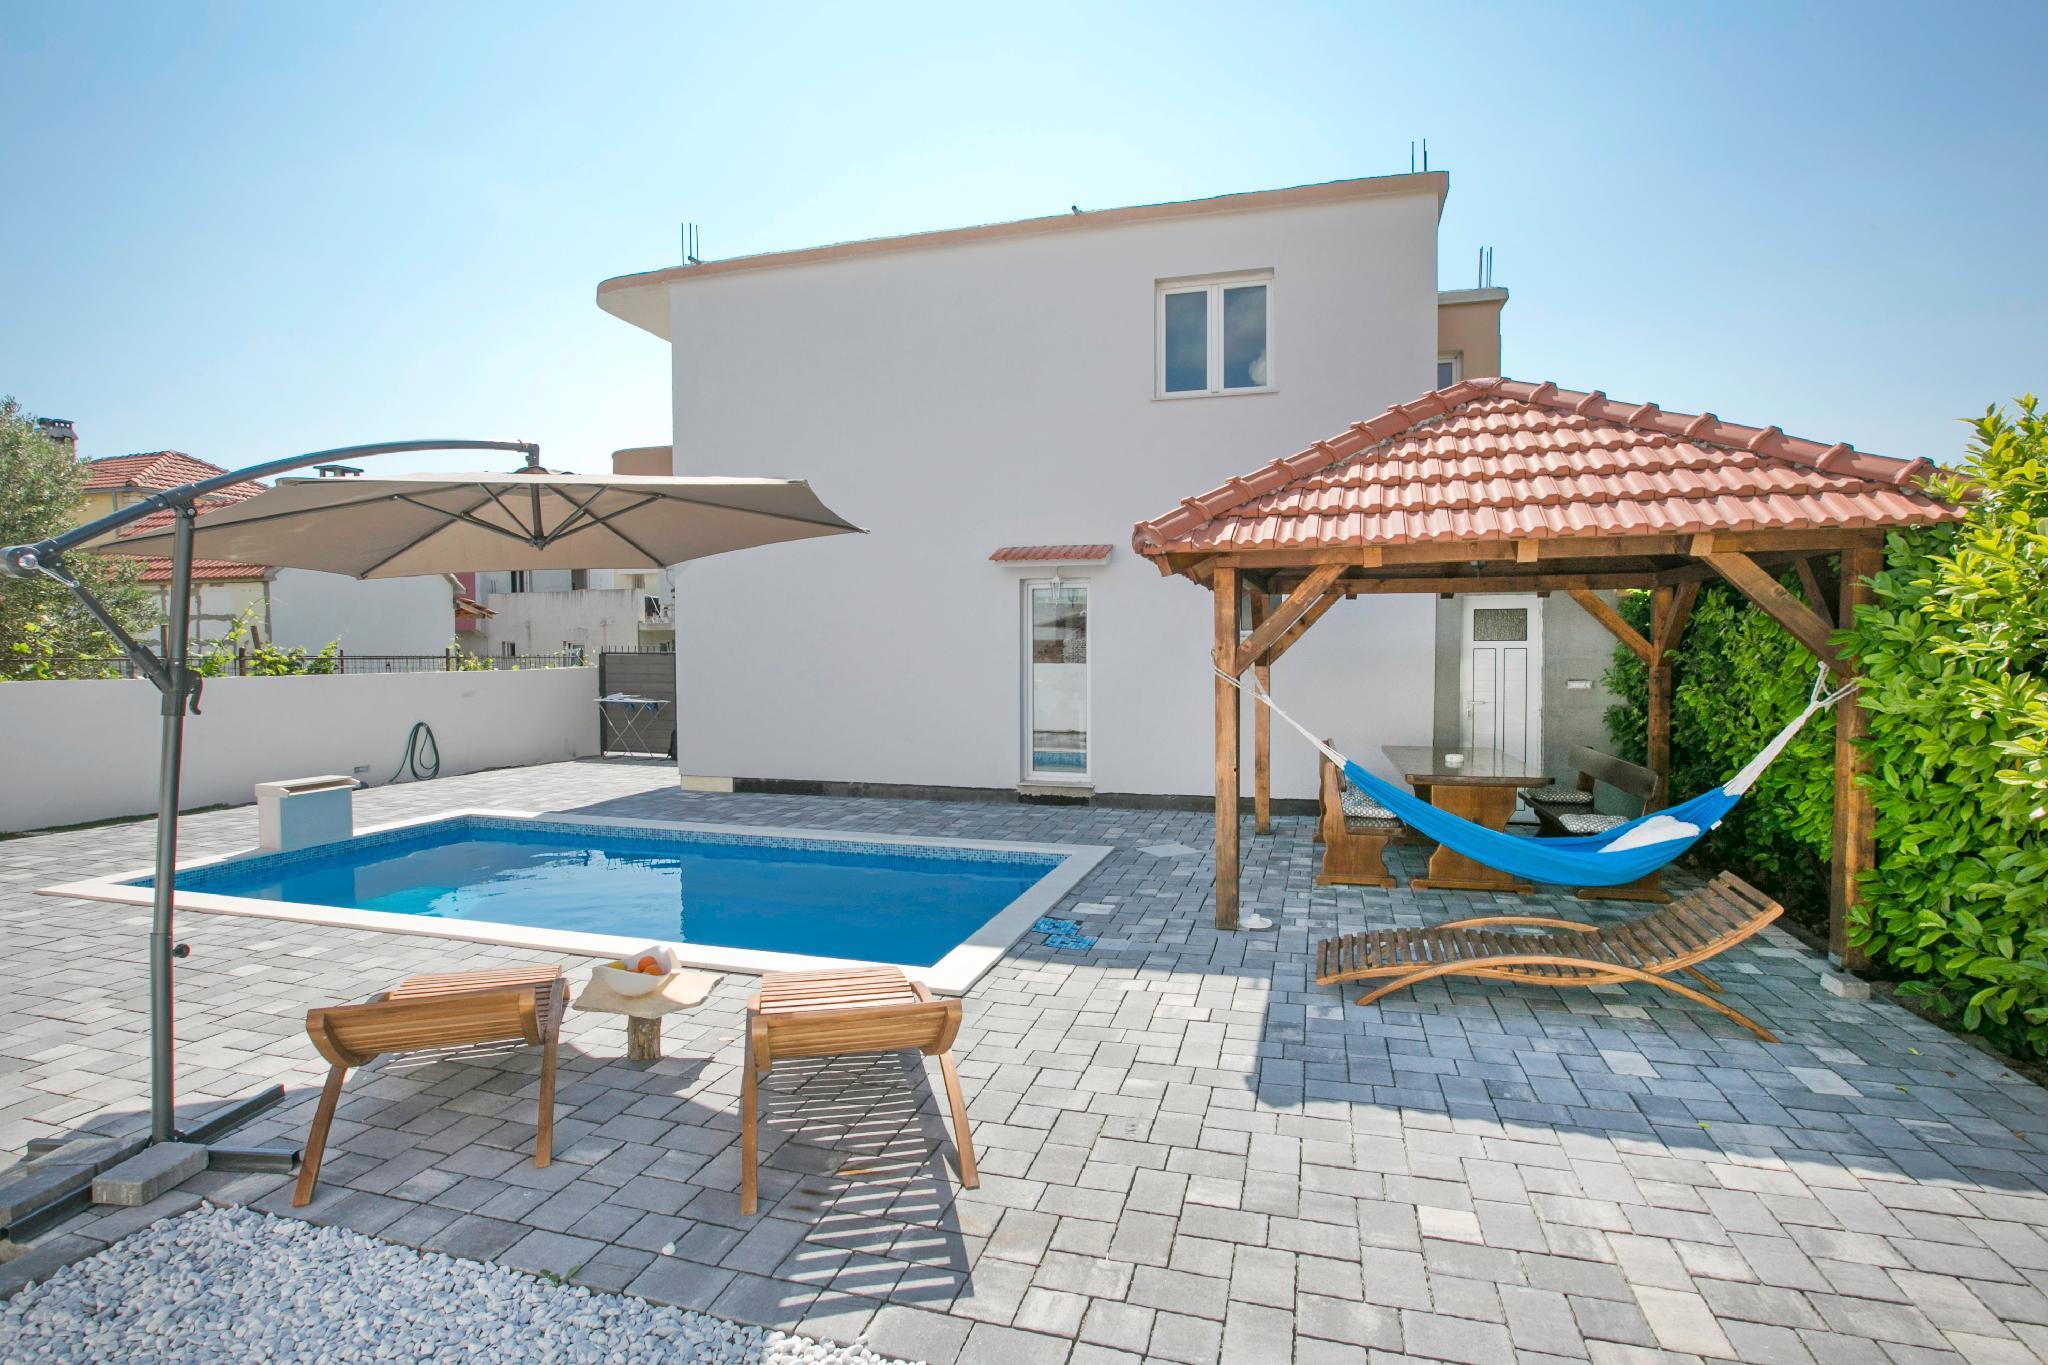 Villa With Pool Dino